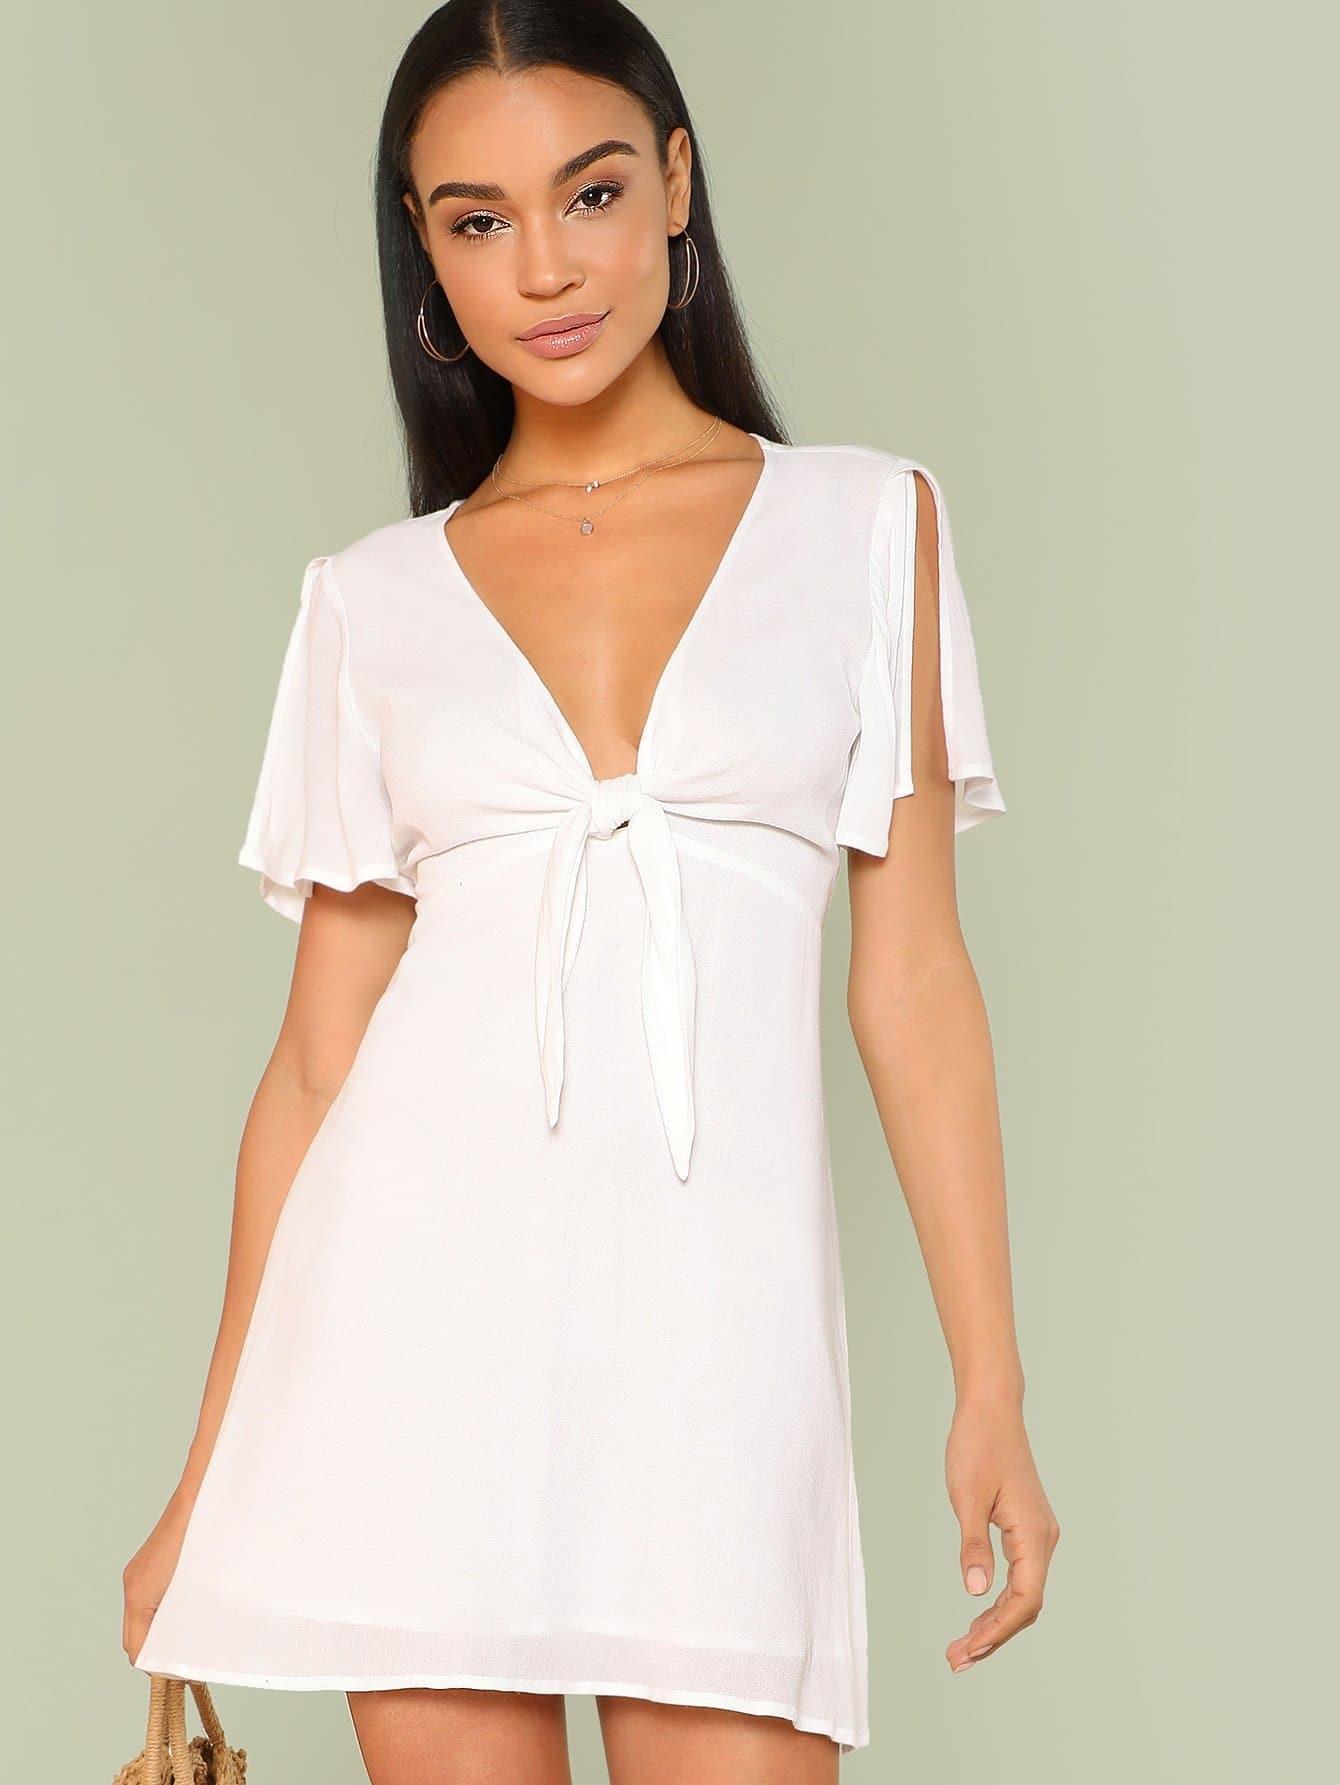 Open Midriff Knot Front Split Sleeve Dress knot front cutout midriff halterneck gingham dress